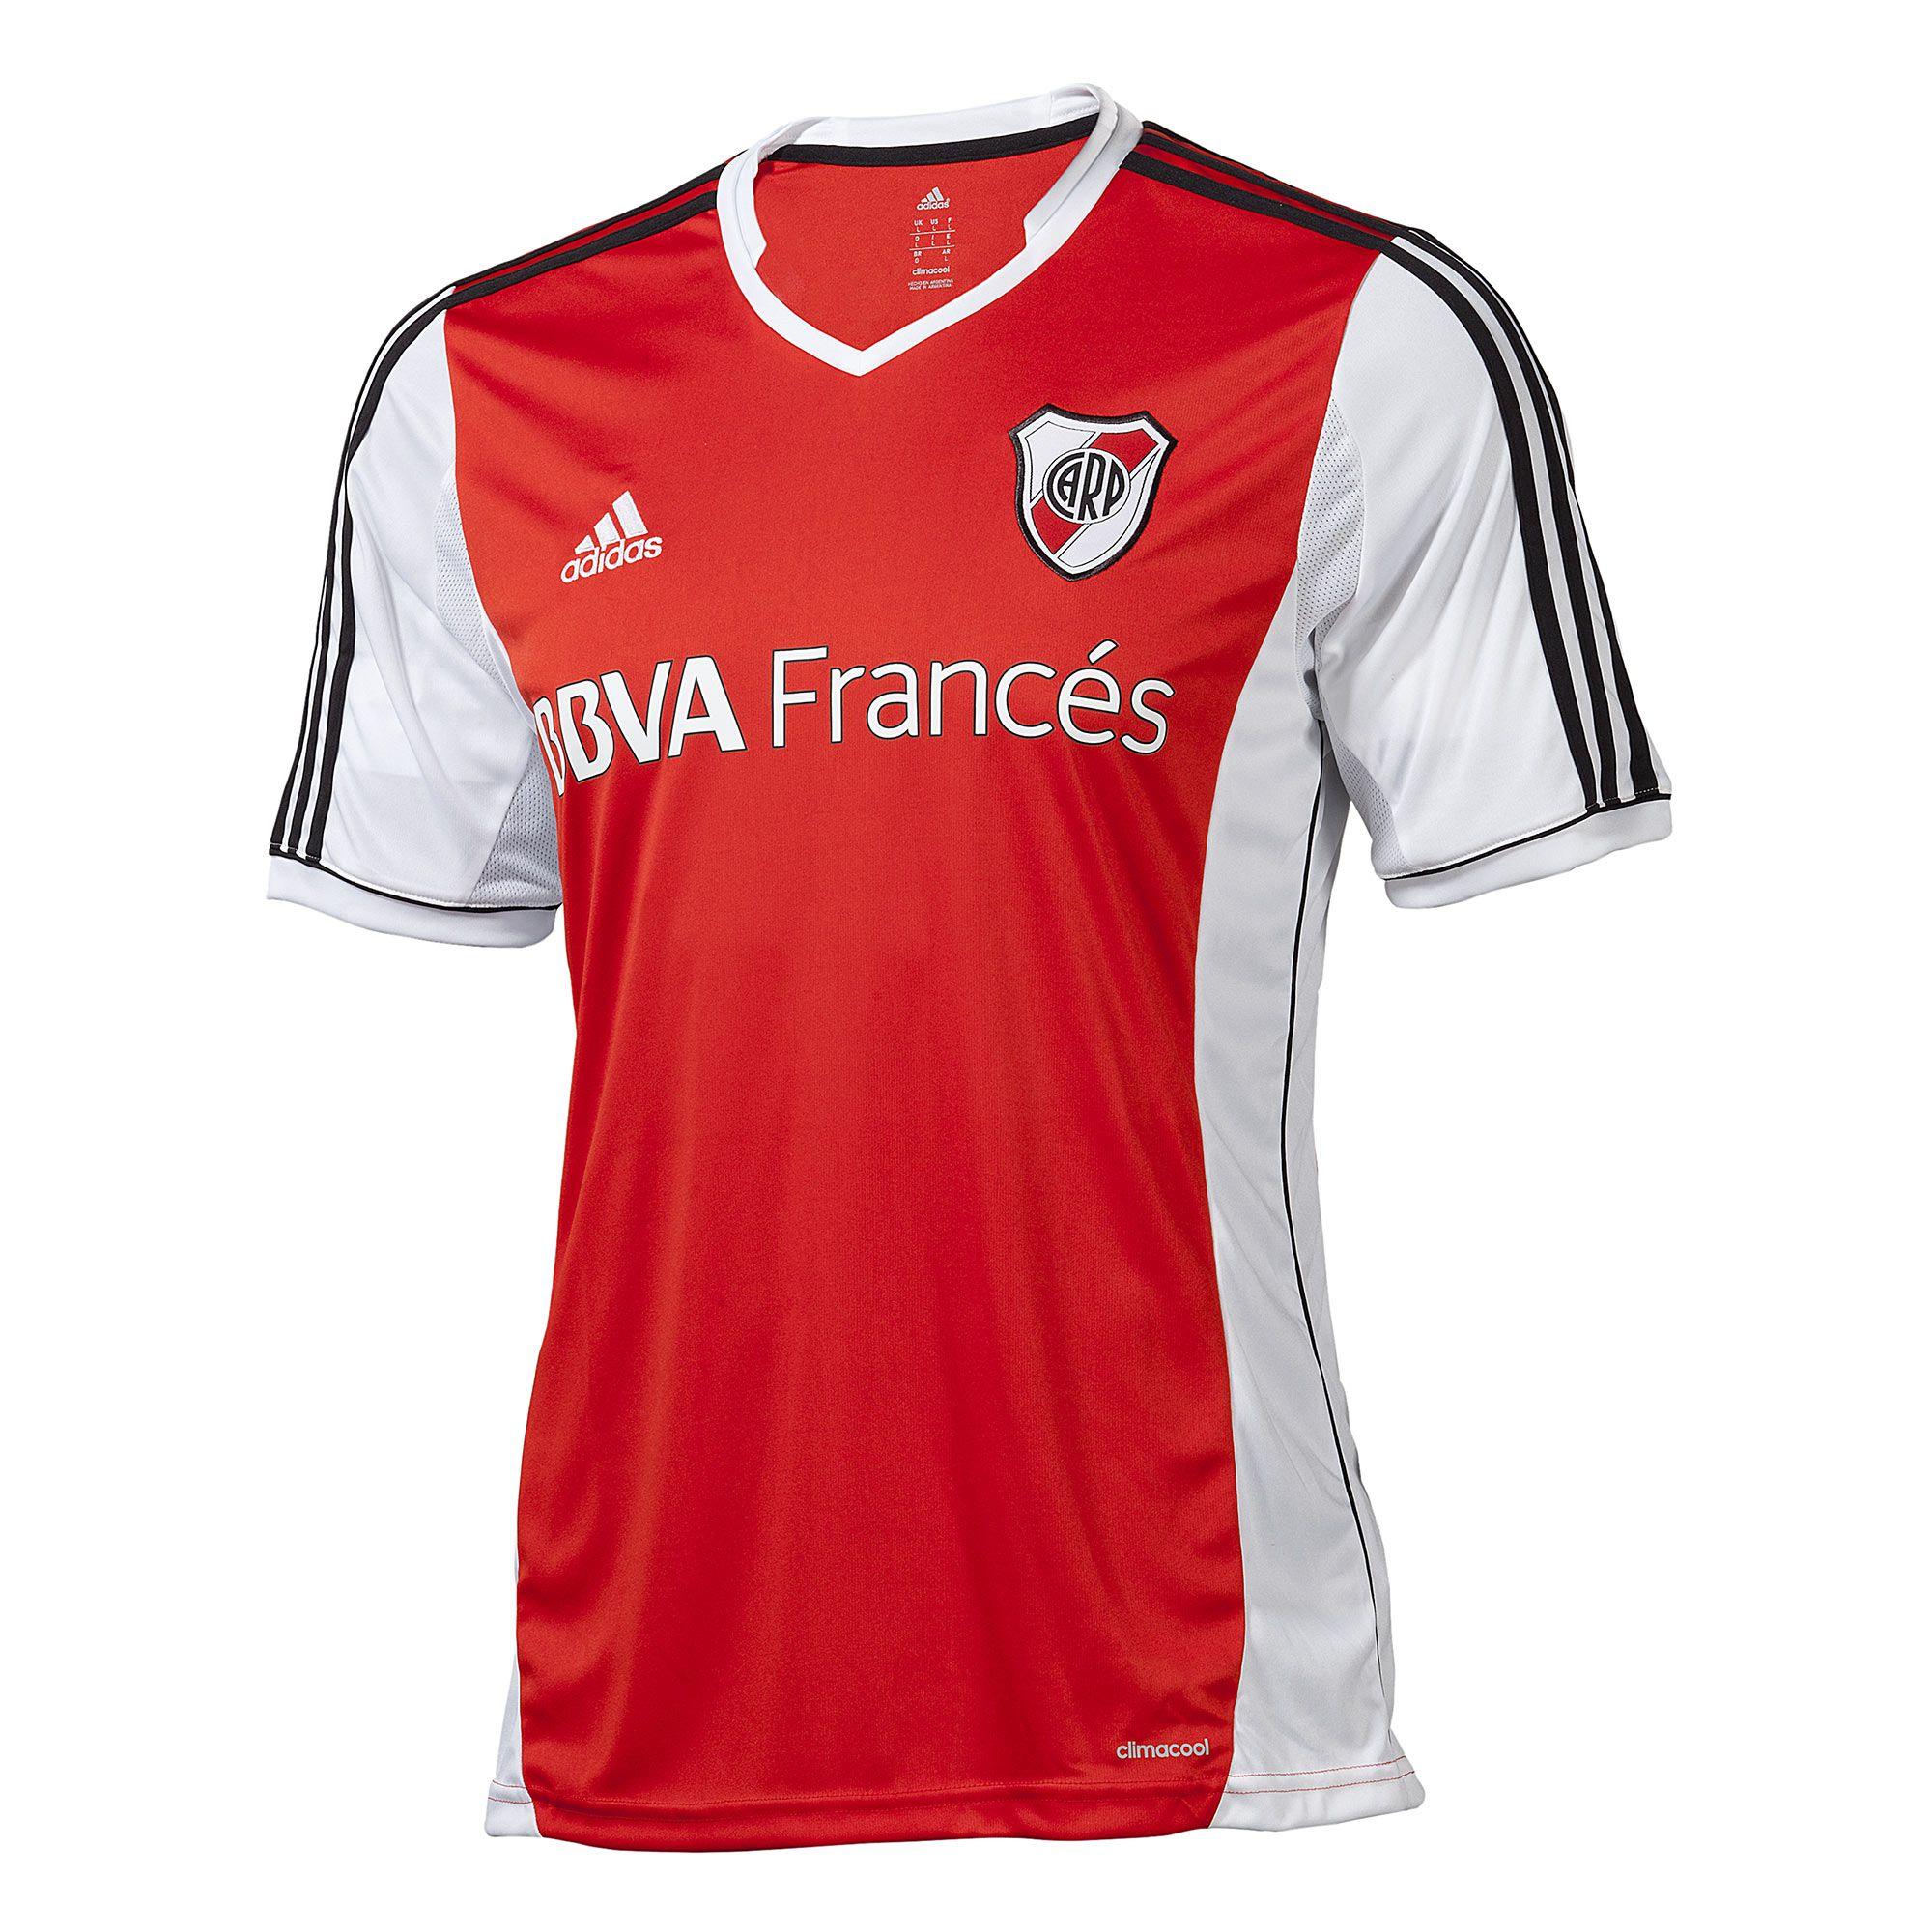 adidas Camiseta Visitante de Fútbol River Plate | adidas Argentina